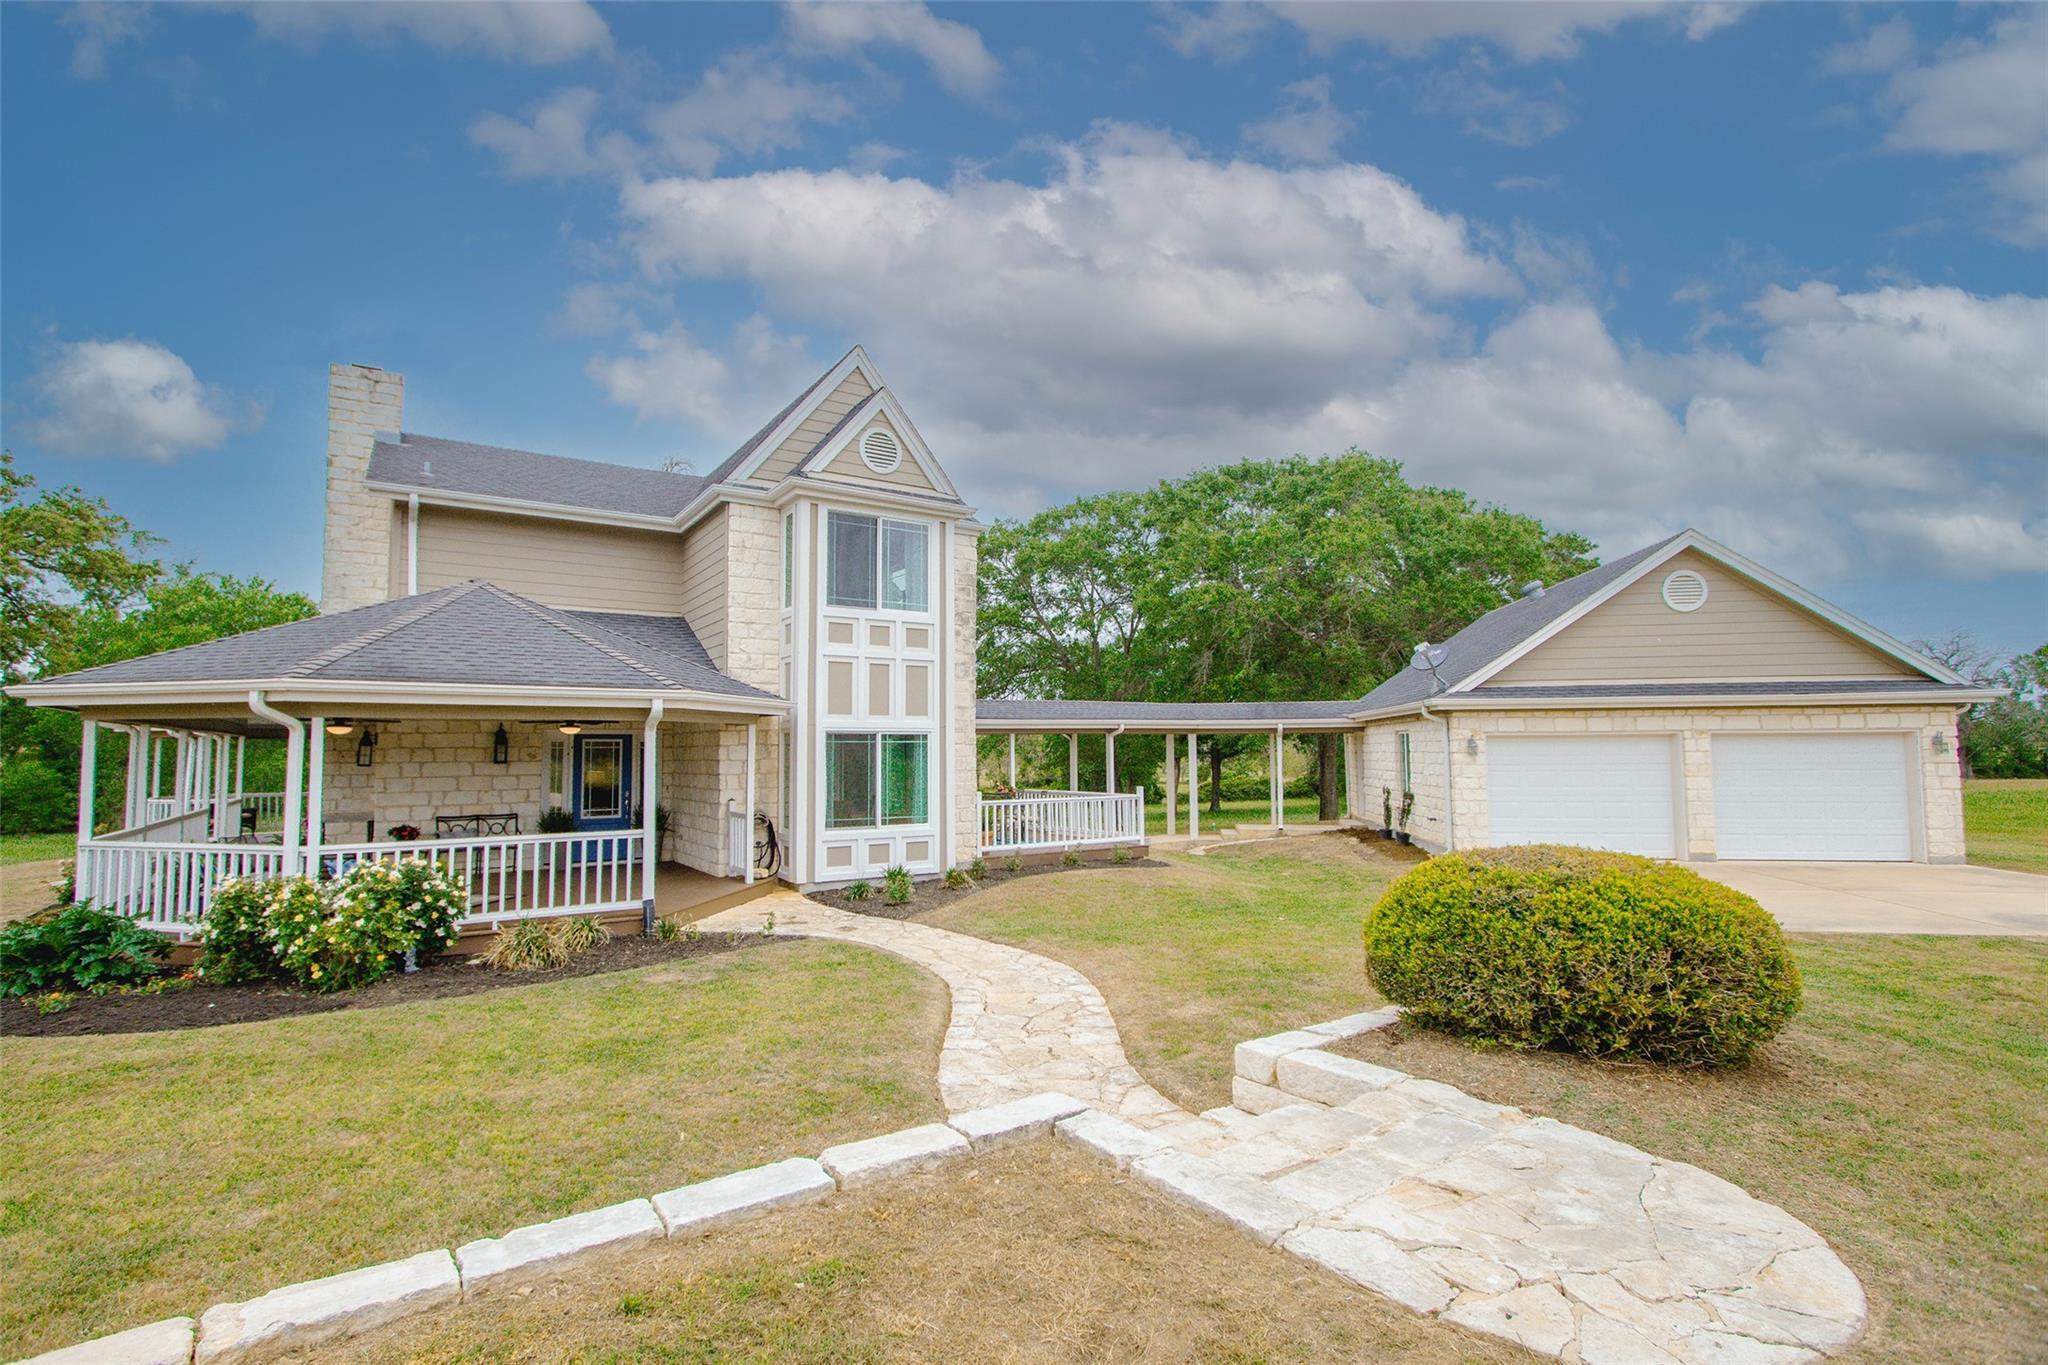 2675 E Fm 696 Property Photo